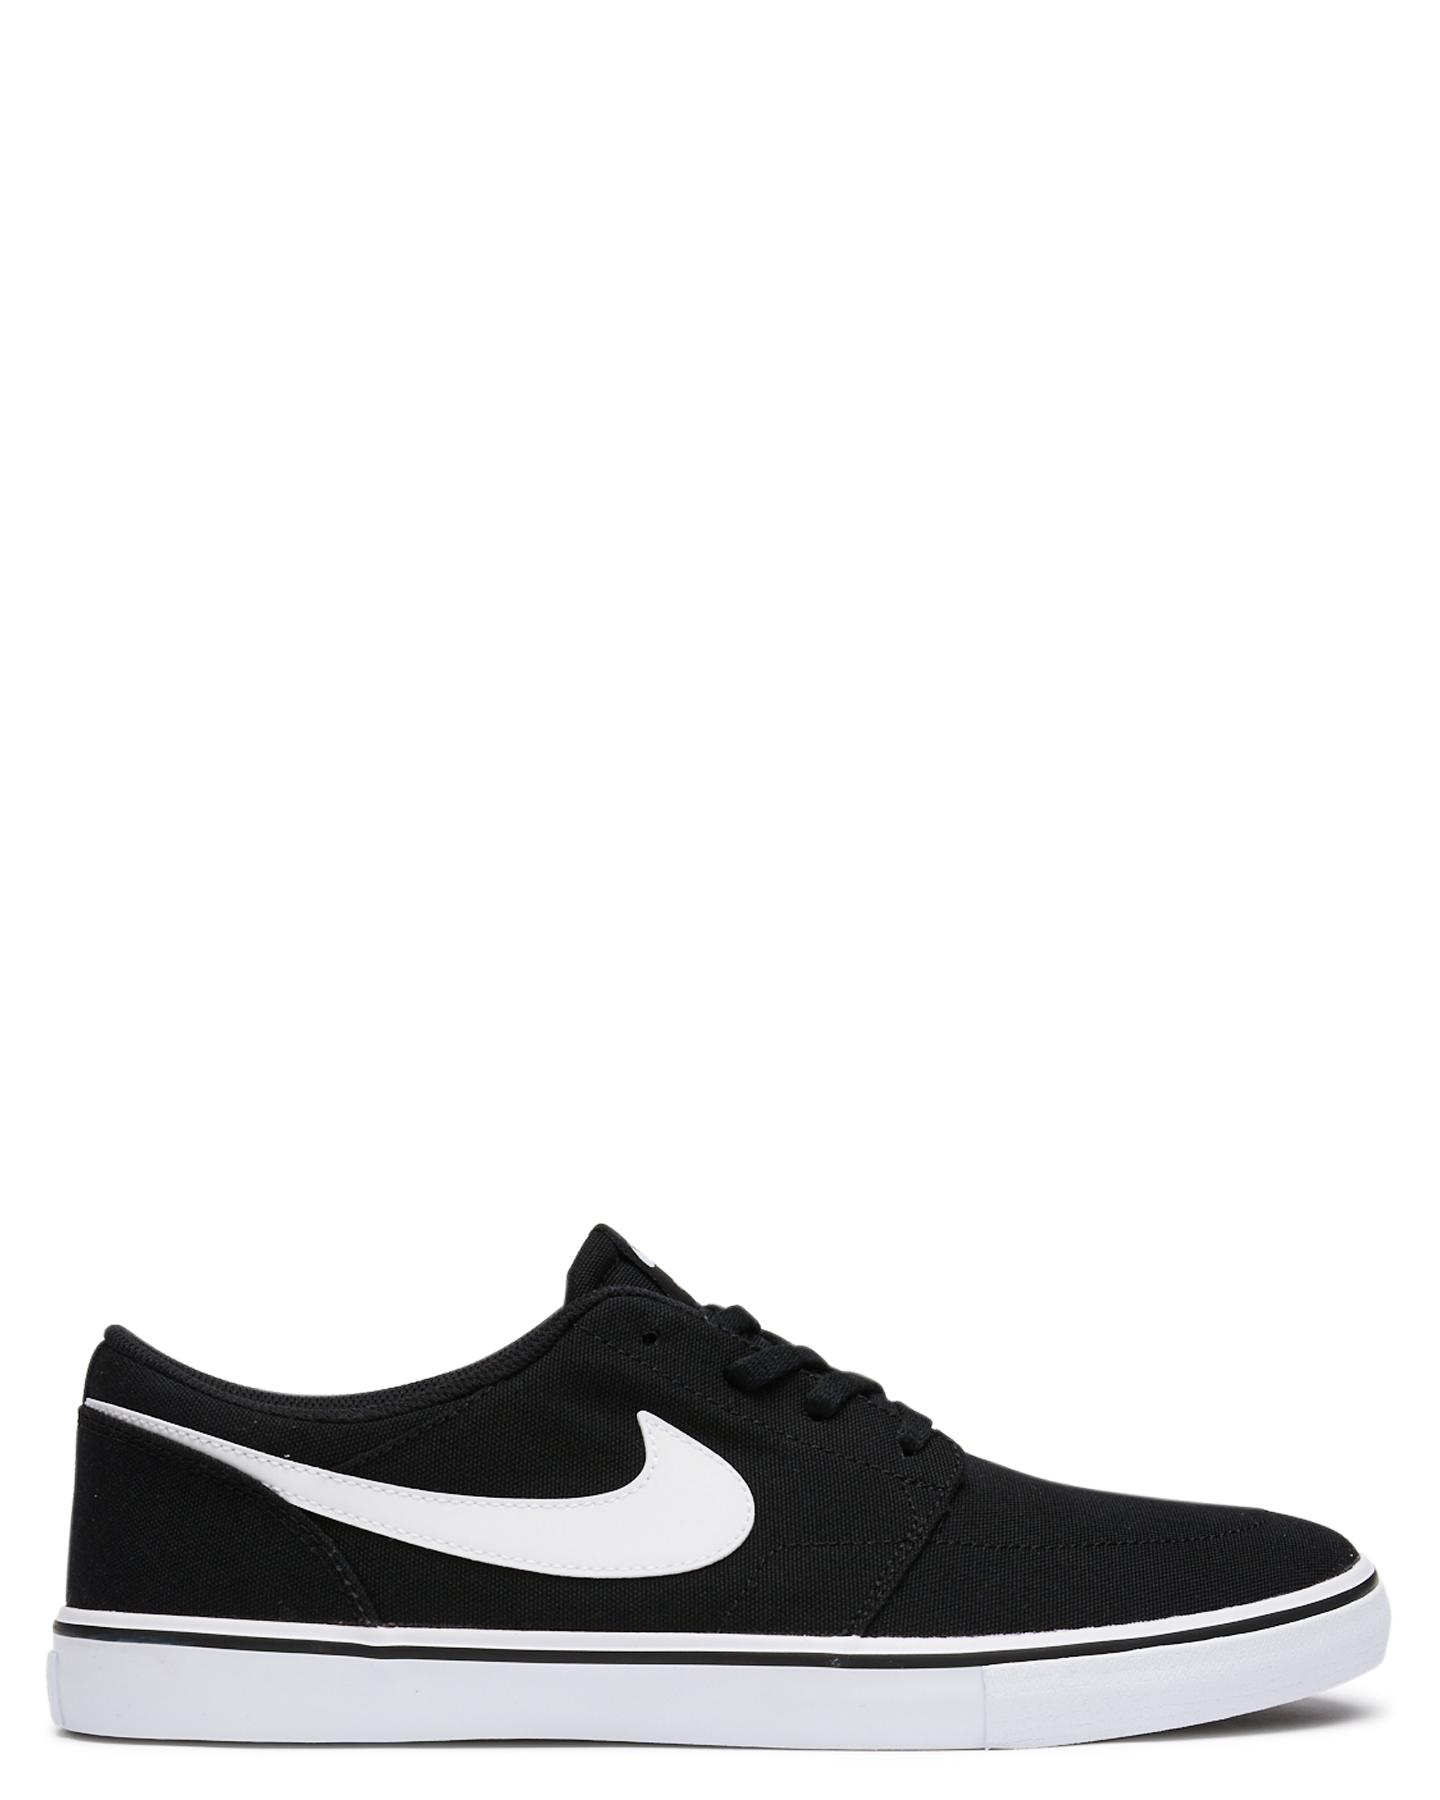 nike mens sb portmore shoes